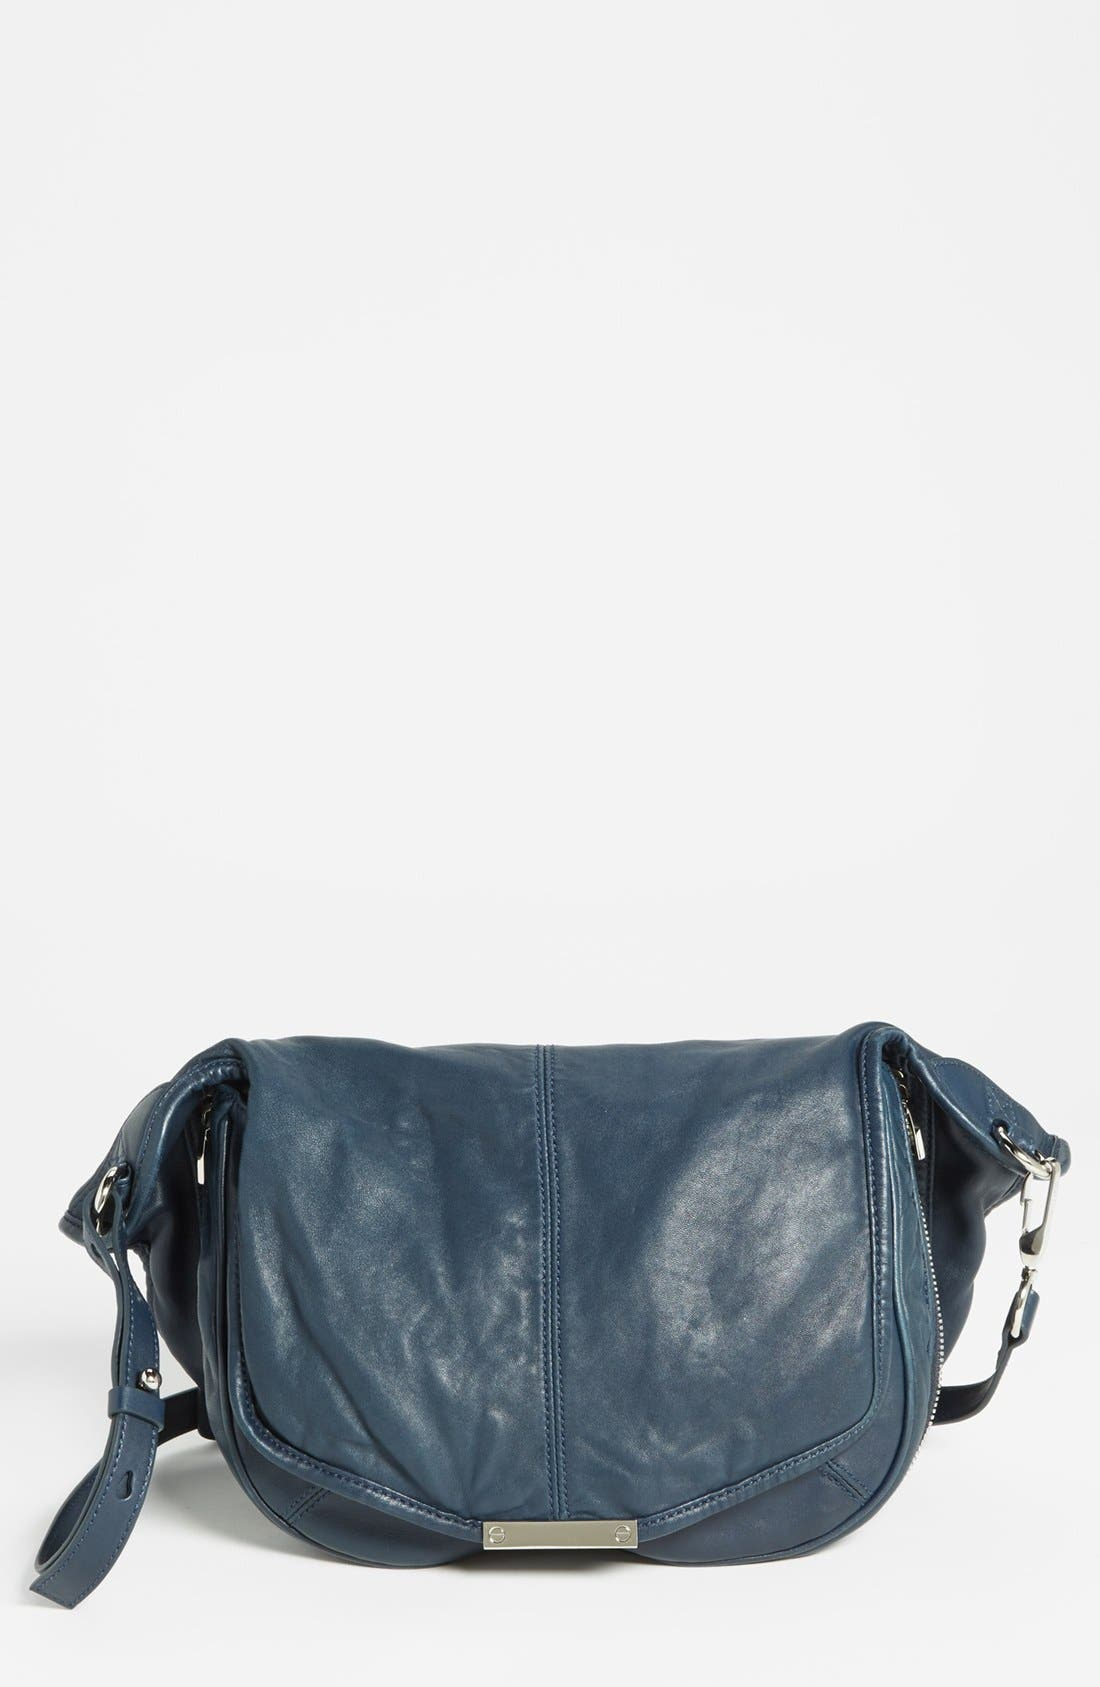 Alternate Image 1 Selected - Alexander Wang 'Iris - Nickel' Leather Crossbody Bag, Medium